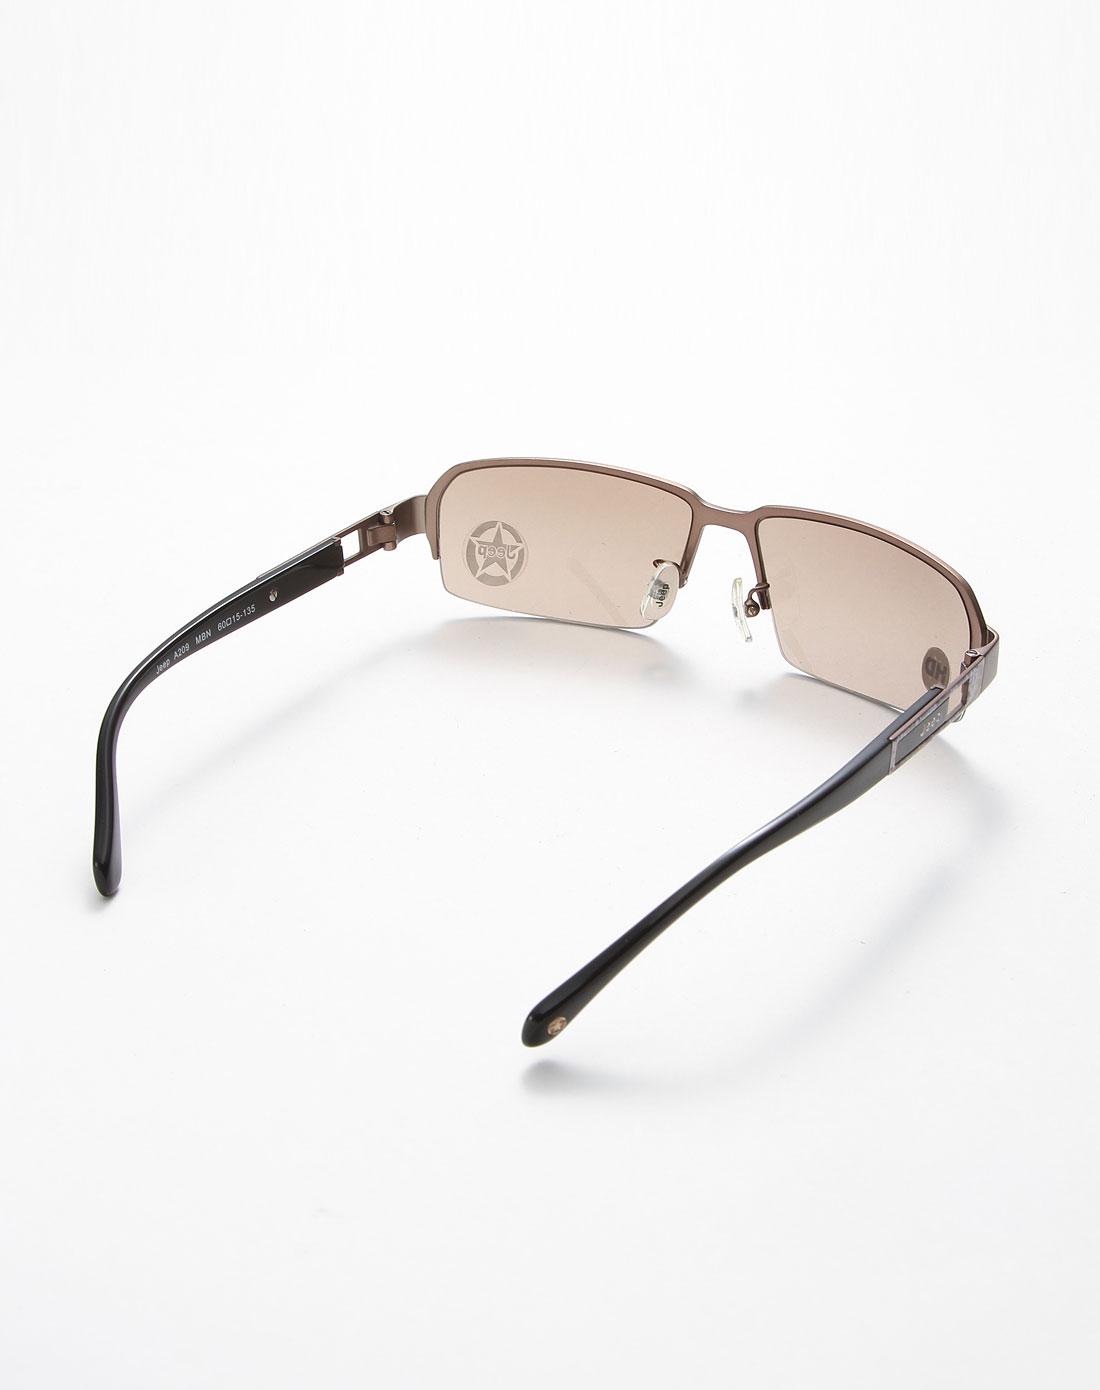 jeep太阳眼镜专场男款成熟大气金属半框太阳眼镜黑